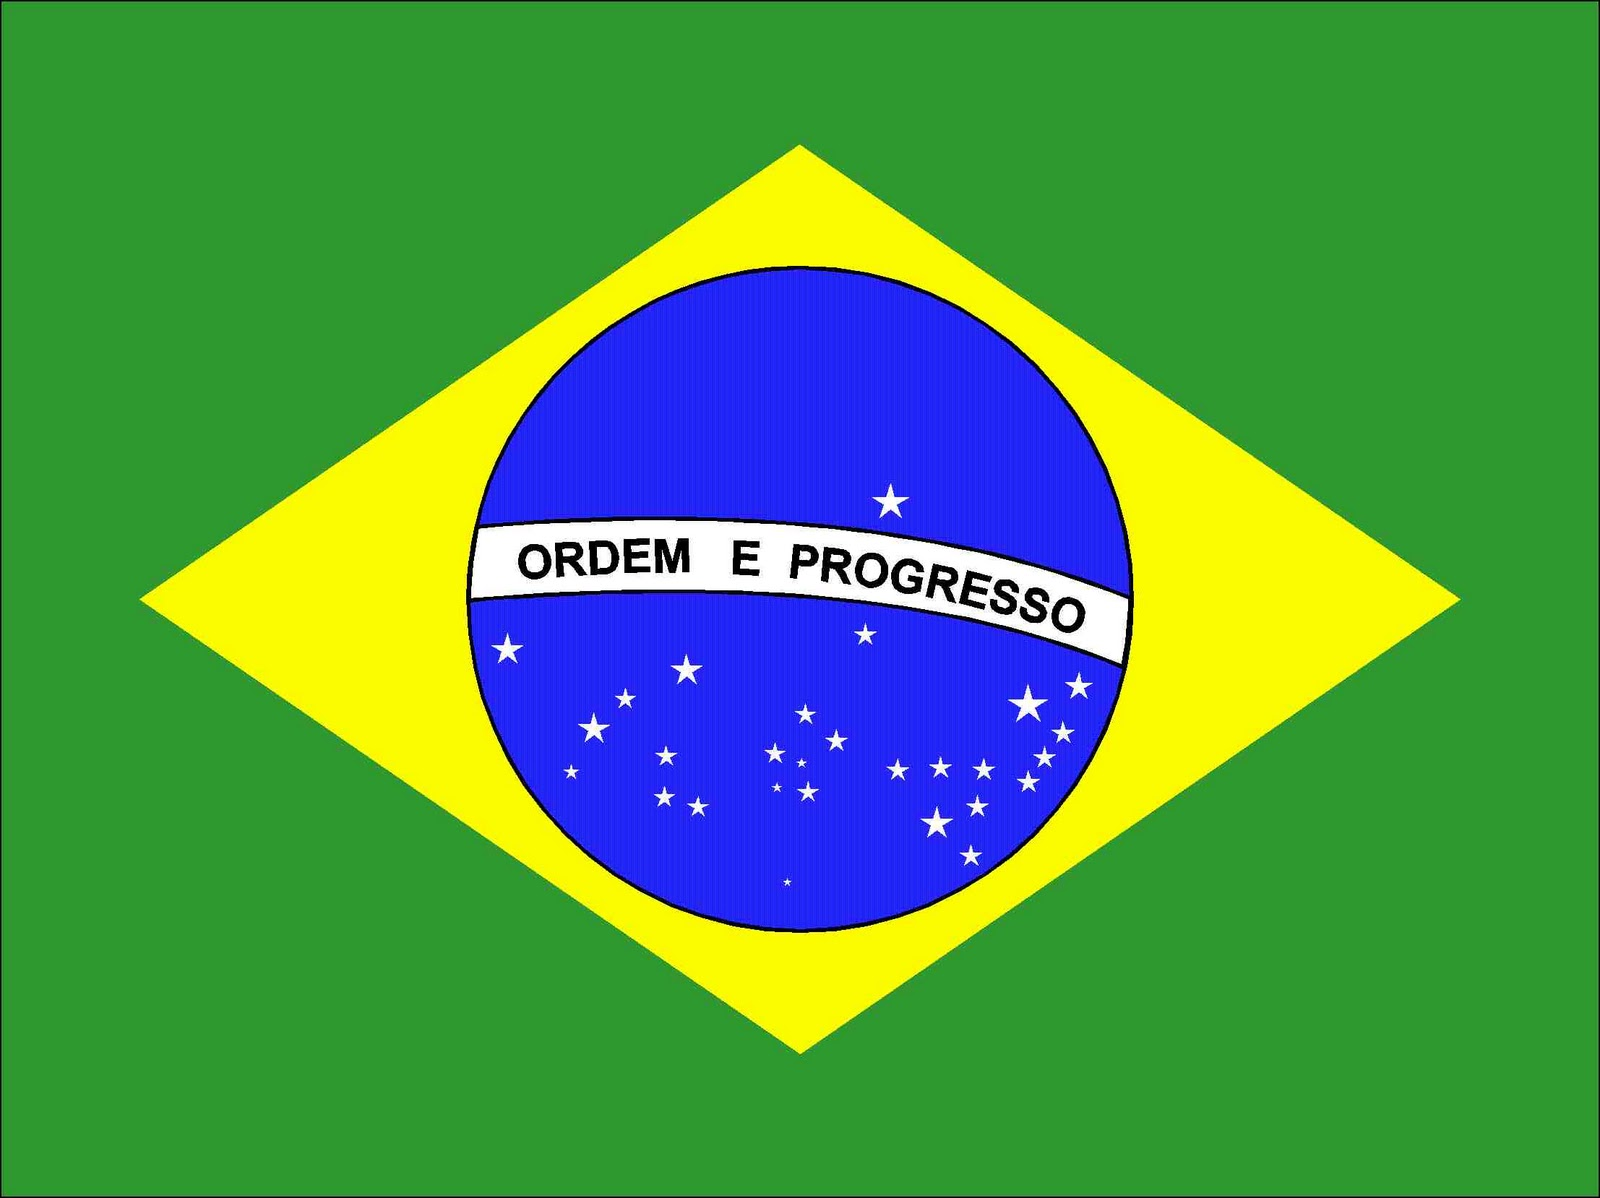 5000-website-visitors-from-Brazil